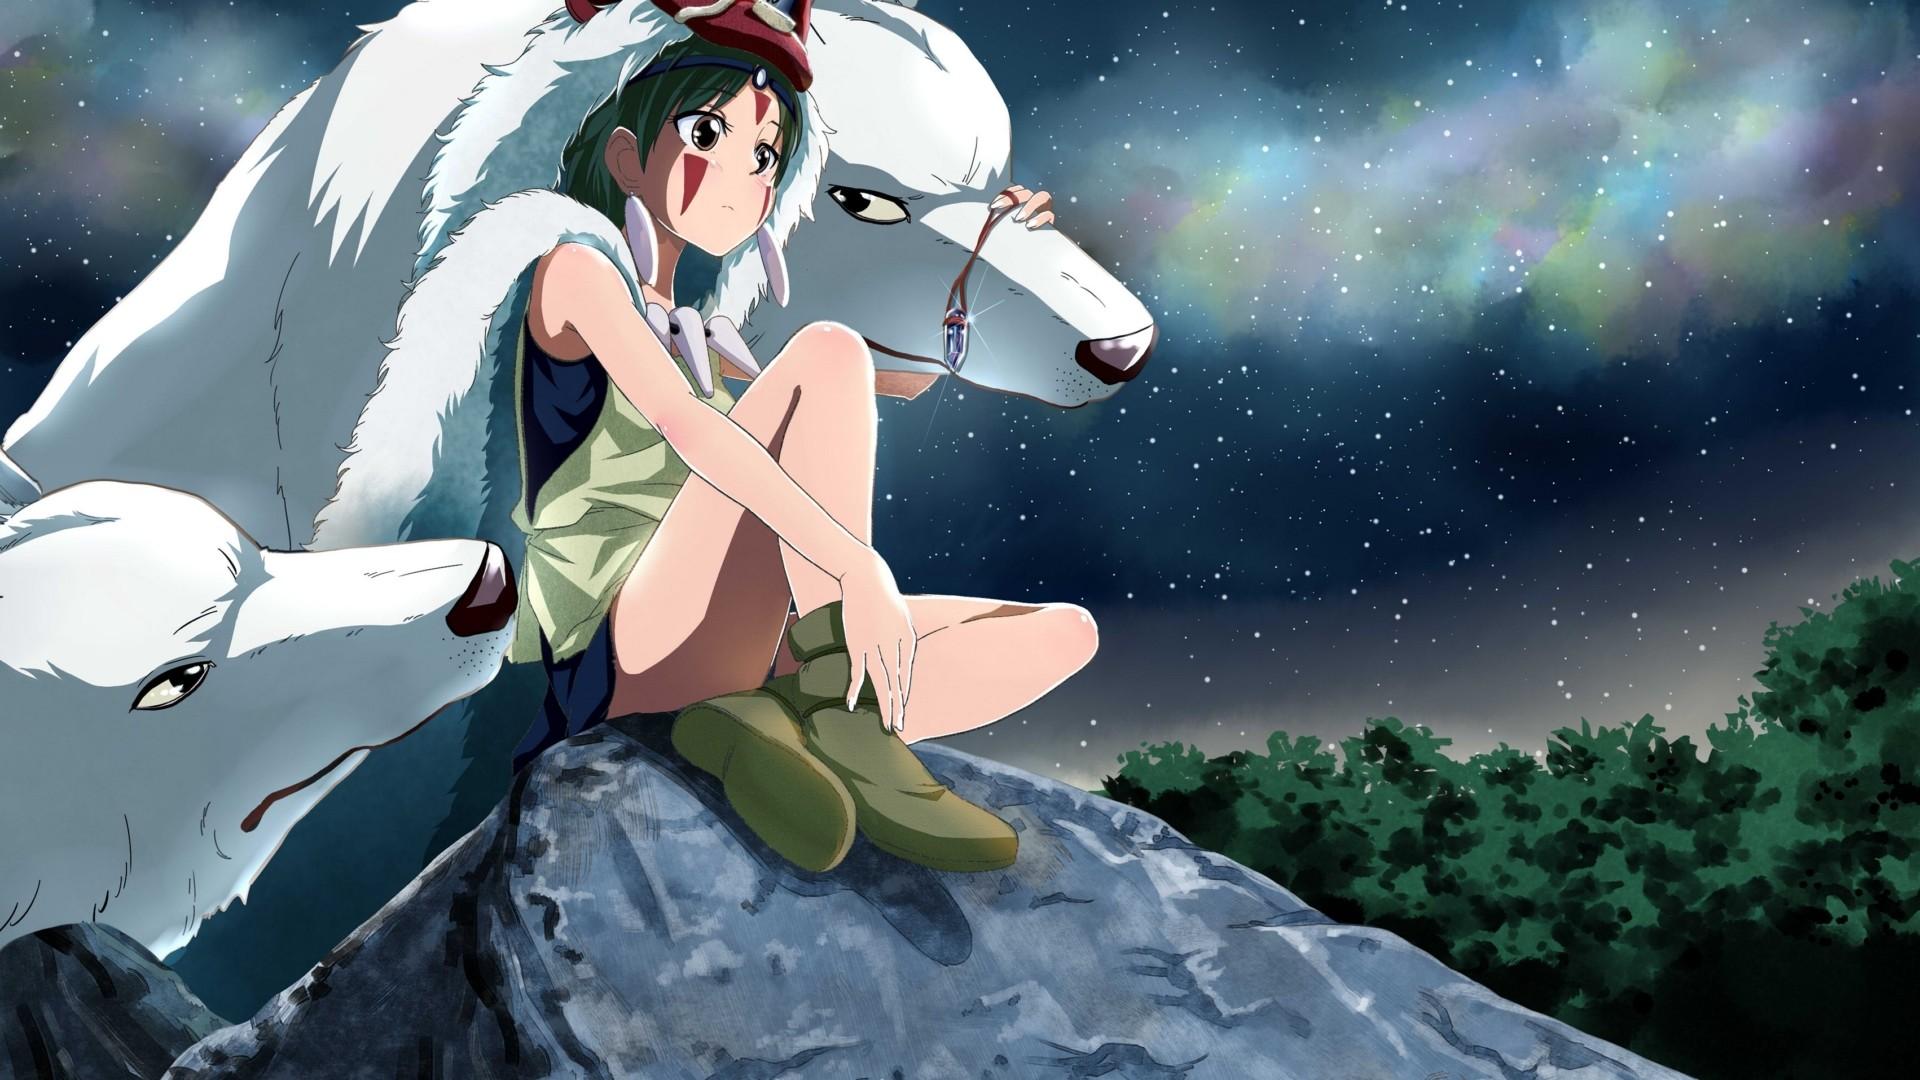 Download Princess Mononoke Hayao Miyazaki Wolf Elite Epic Anime Wallpaper  In Many Resolutions